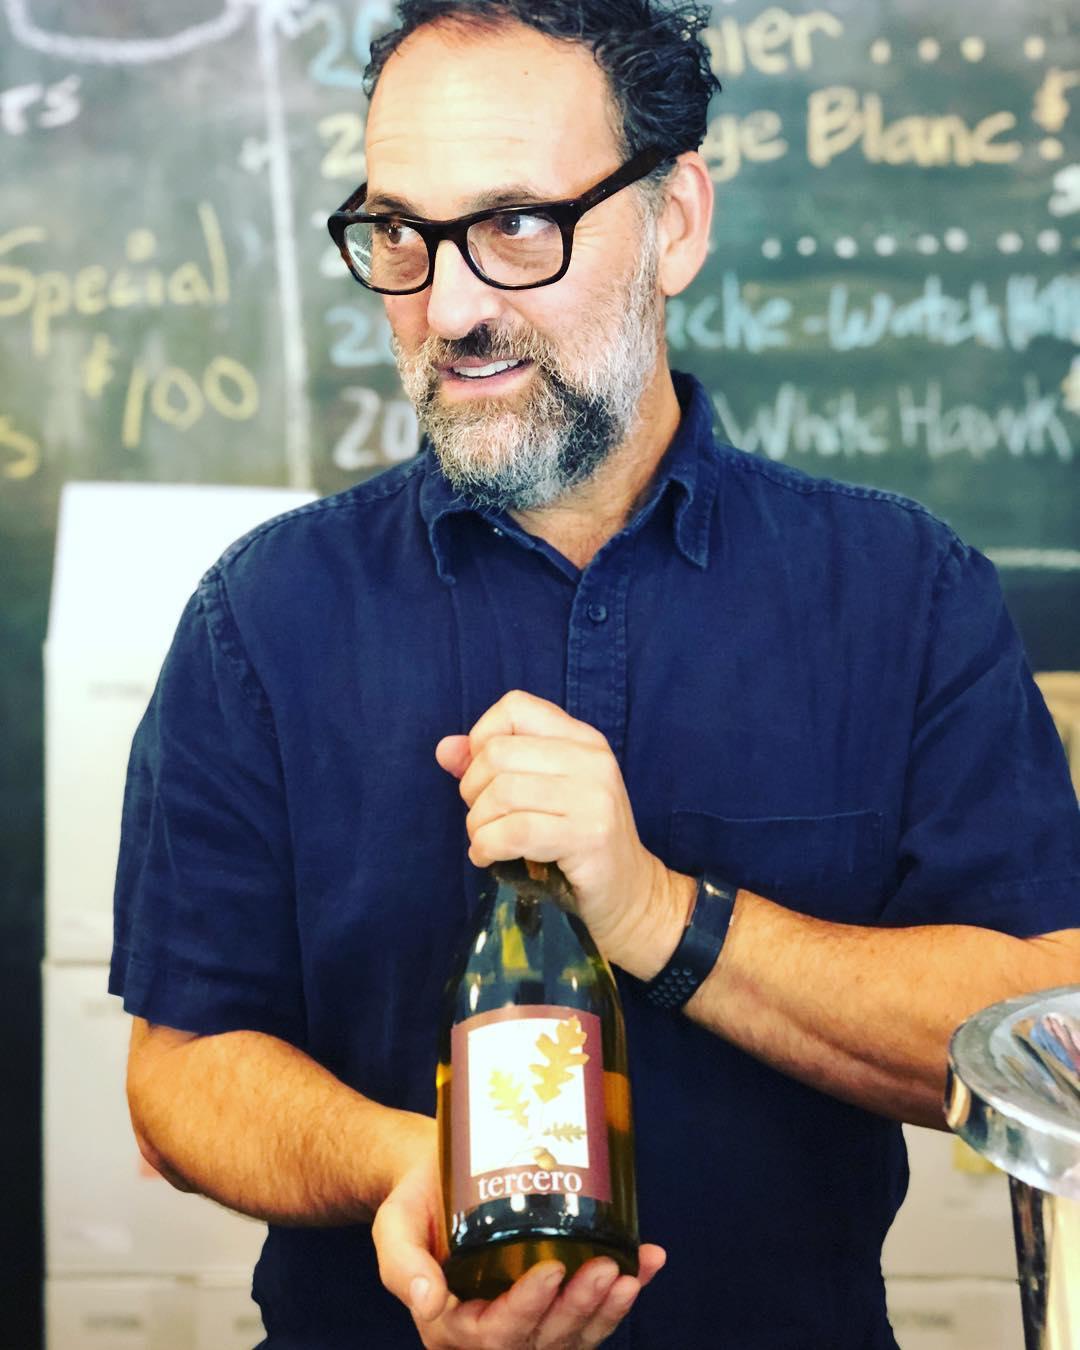 Winemaker Larry Schaffer